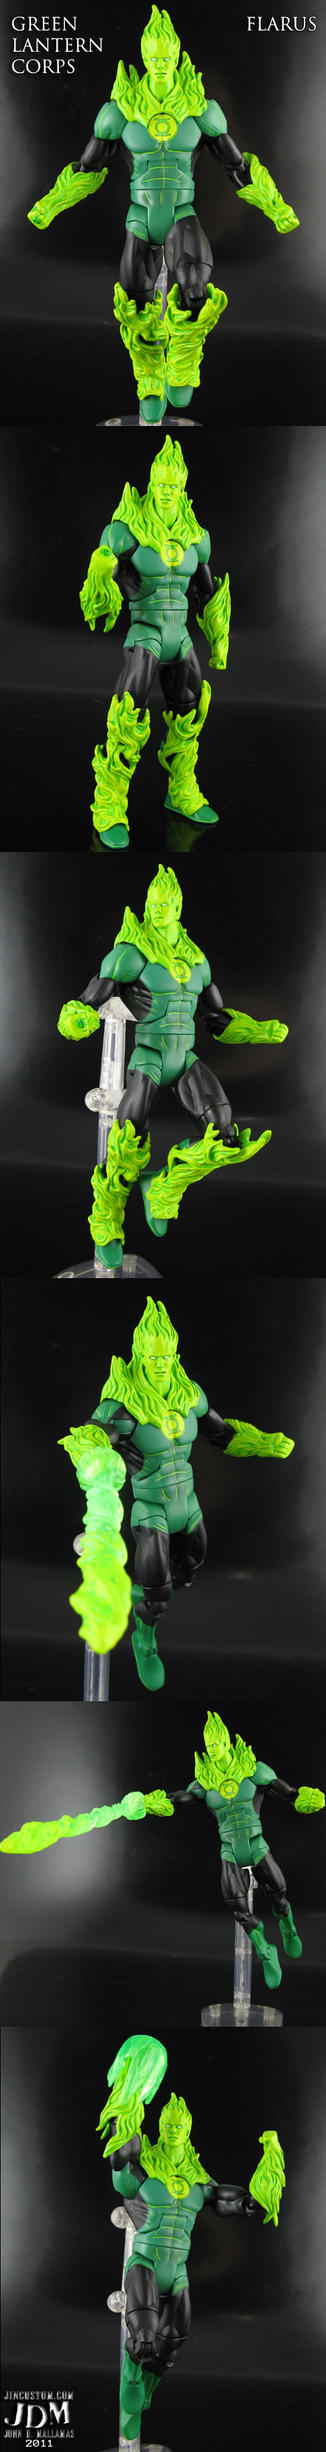 Green Lantern Corps Flarus by Jin-Saotome